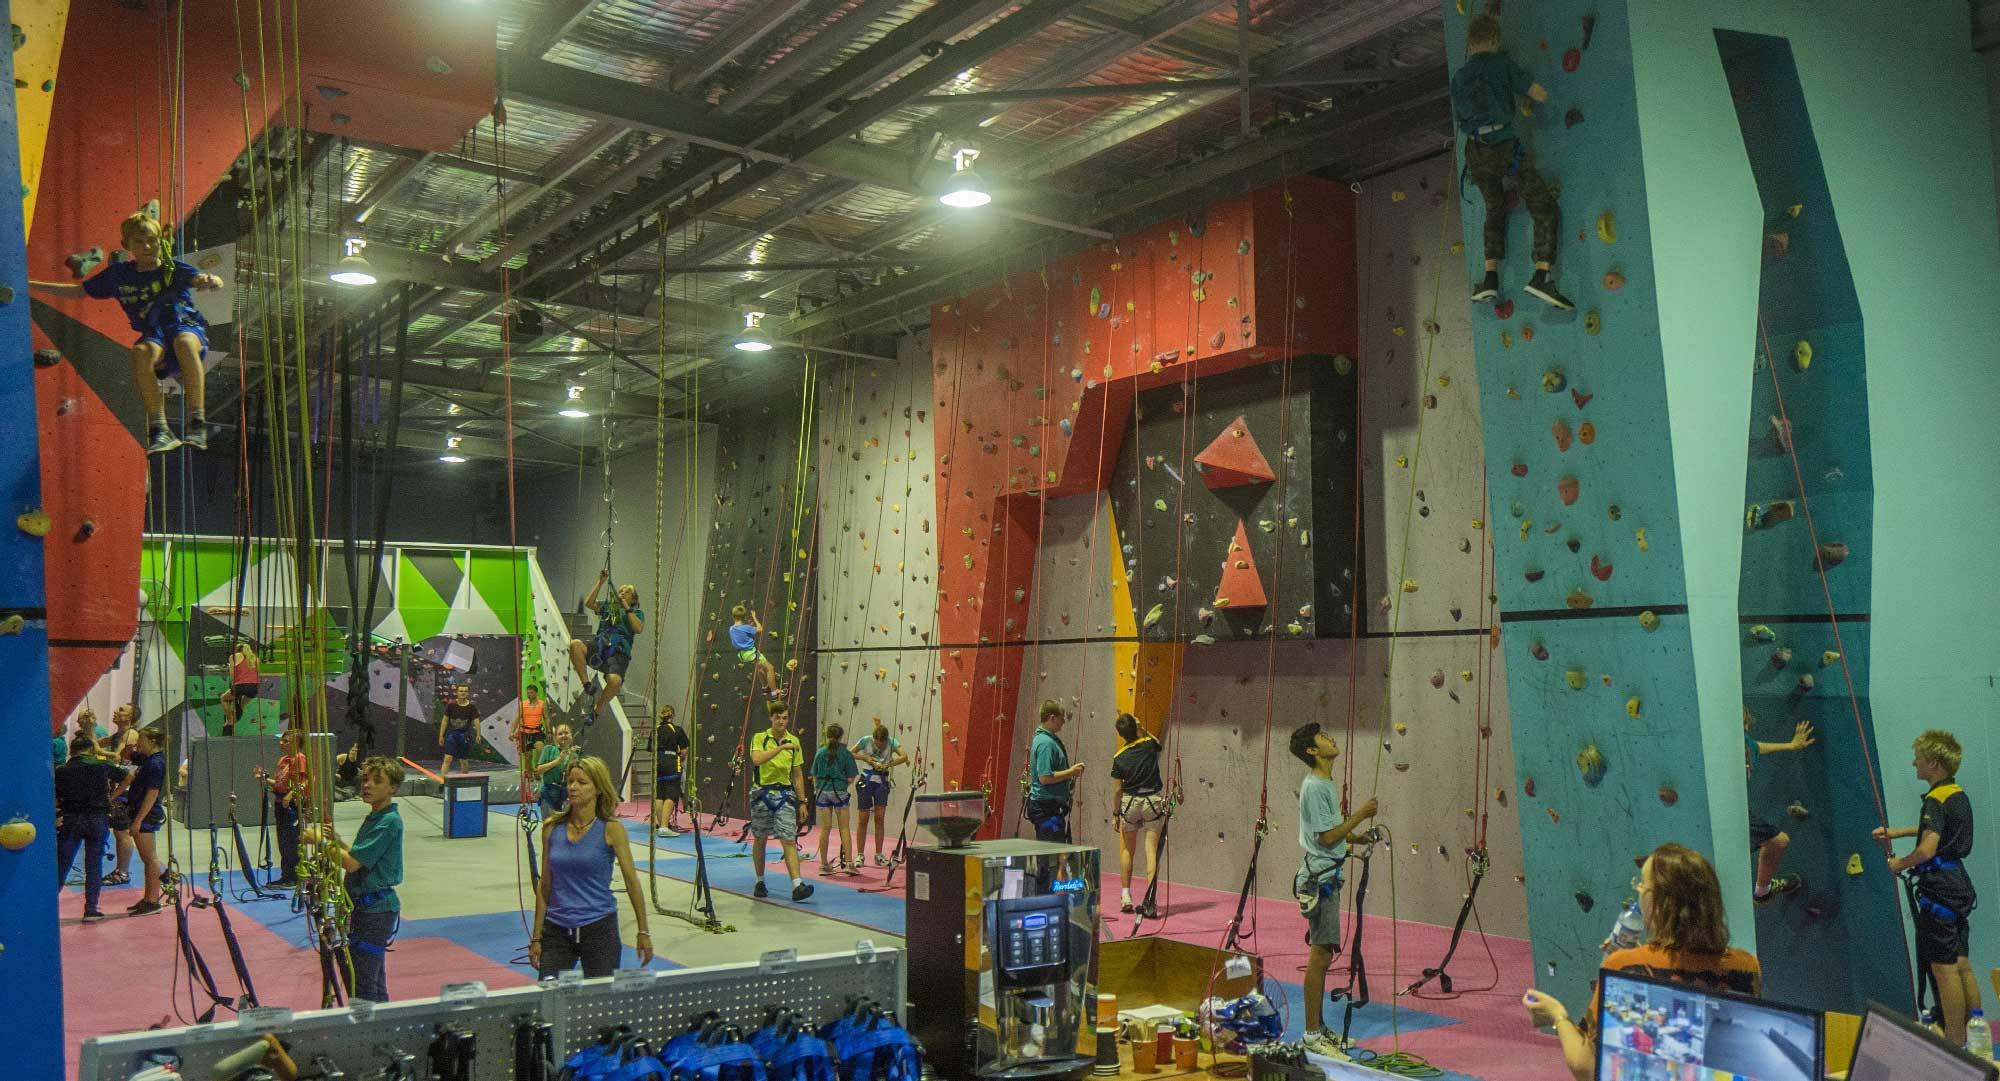 Mandurah Rock Climbing Centre